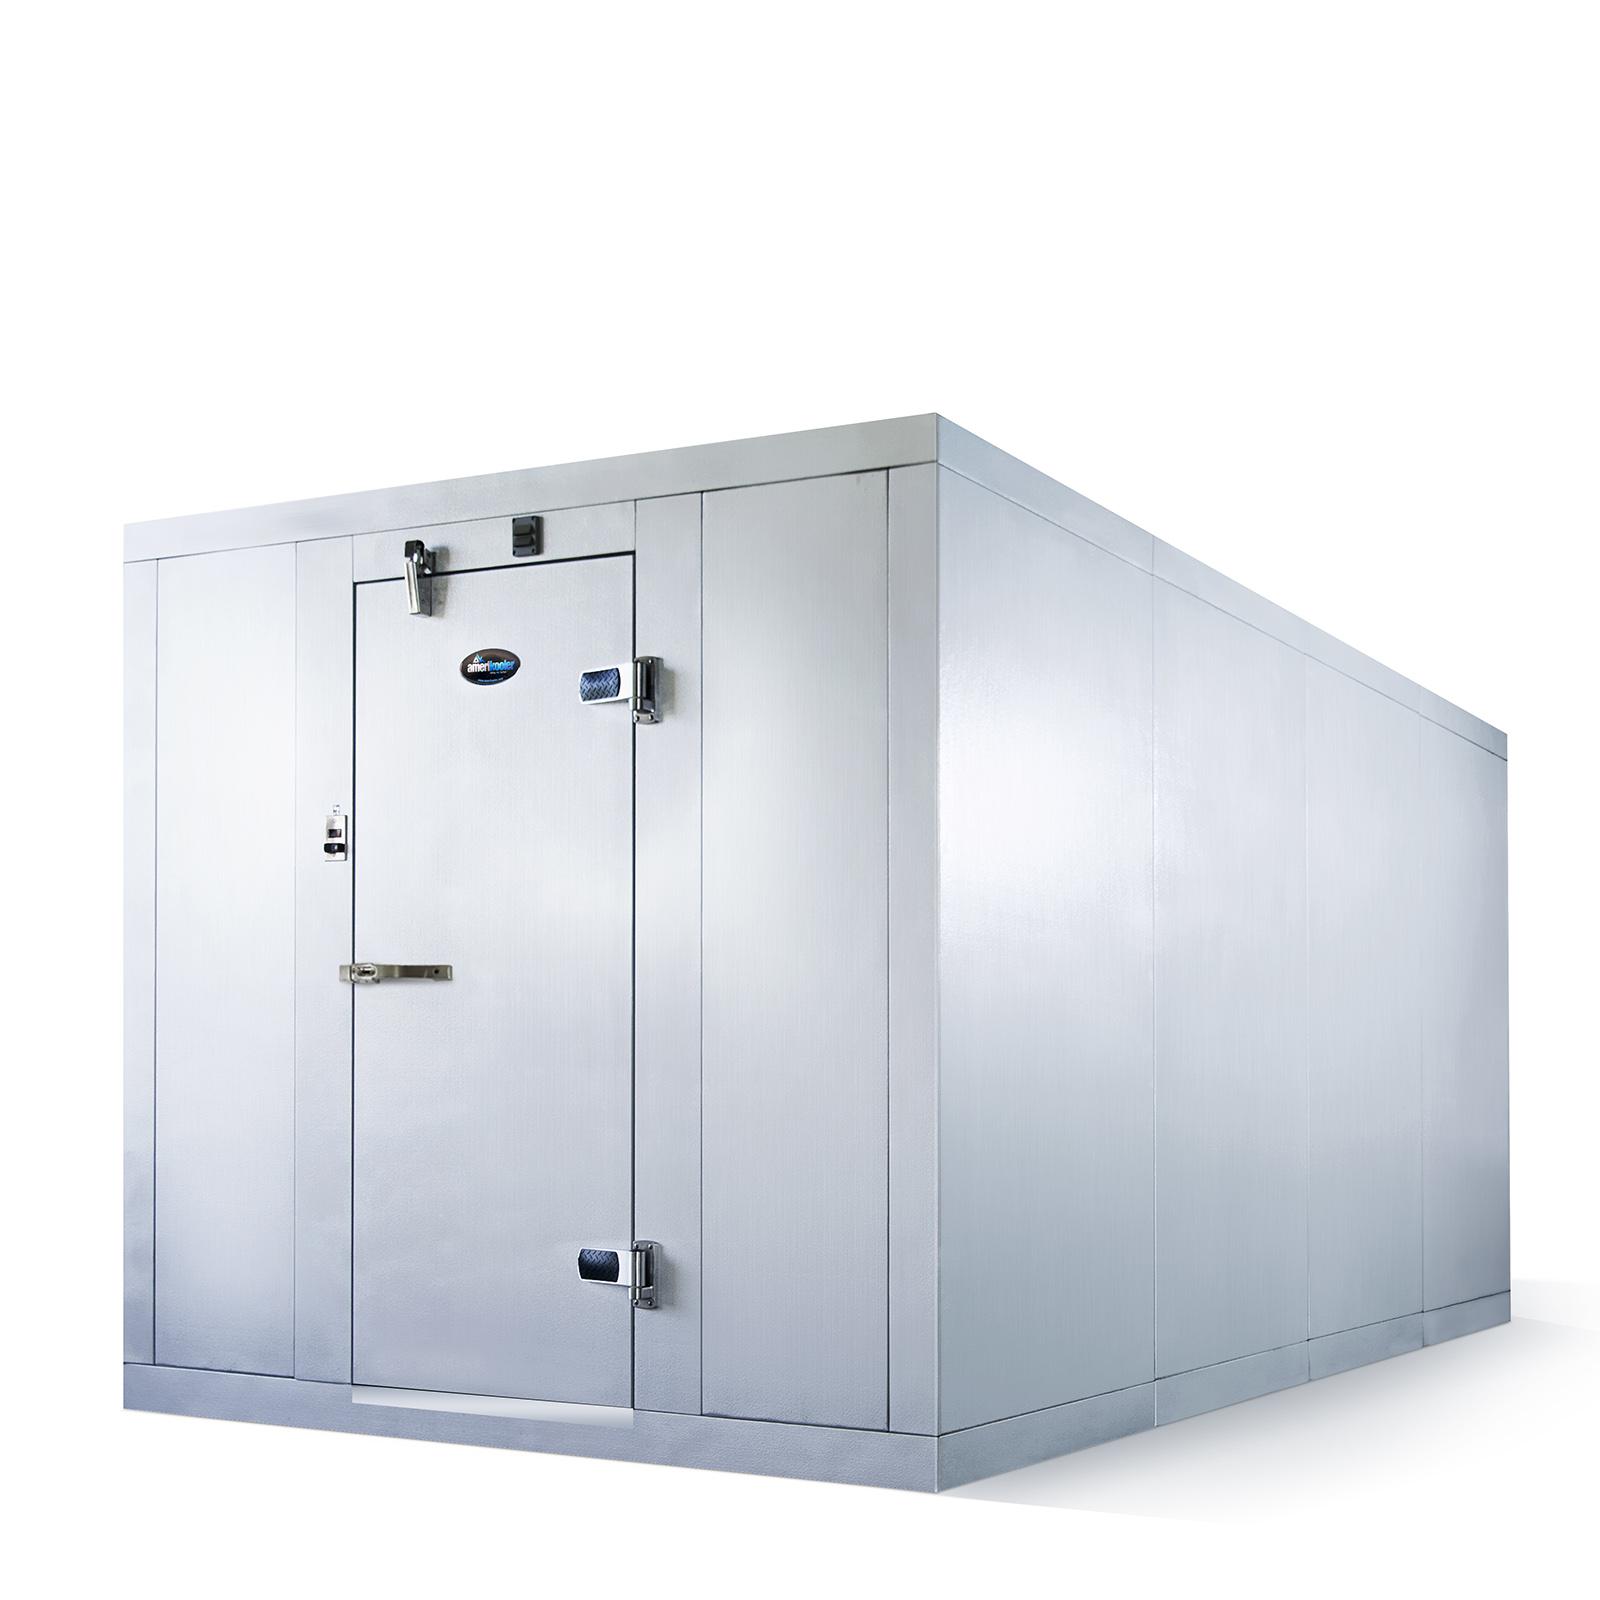 AmeriKooler DF091877**FBRM walk in freezer, modular, remote